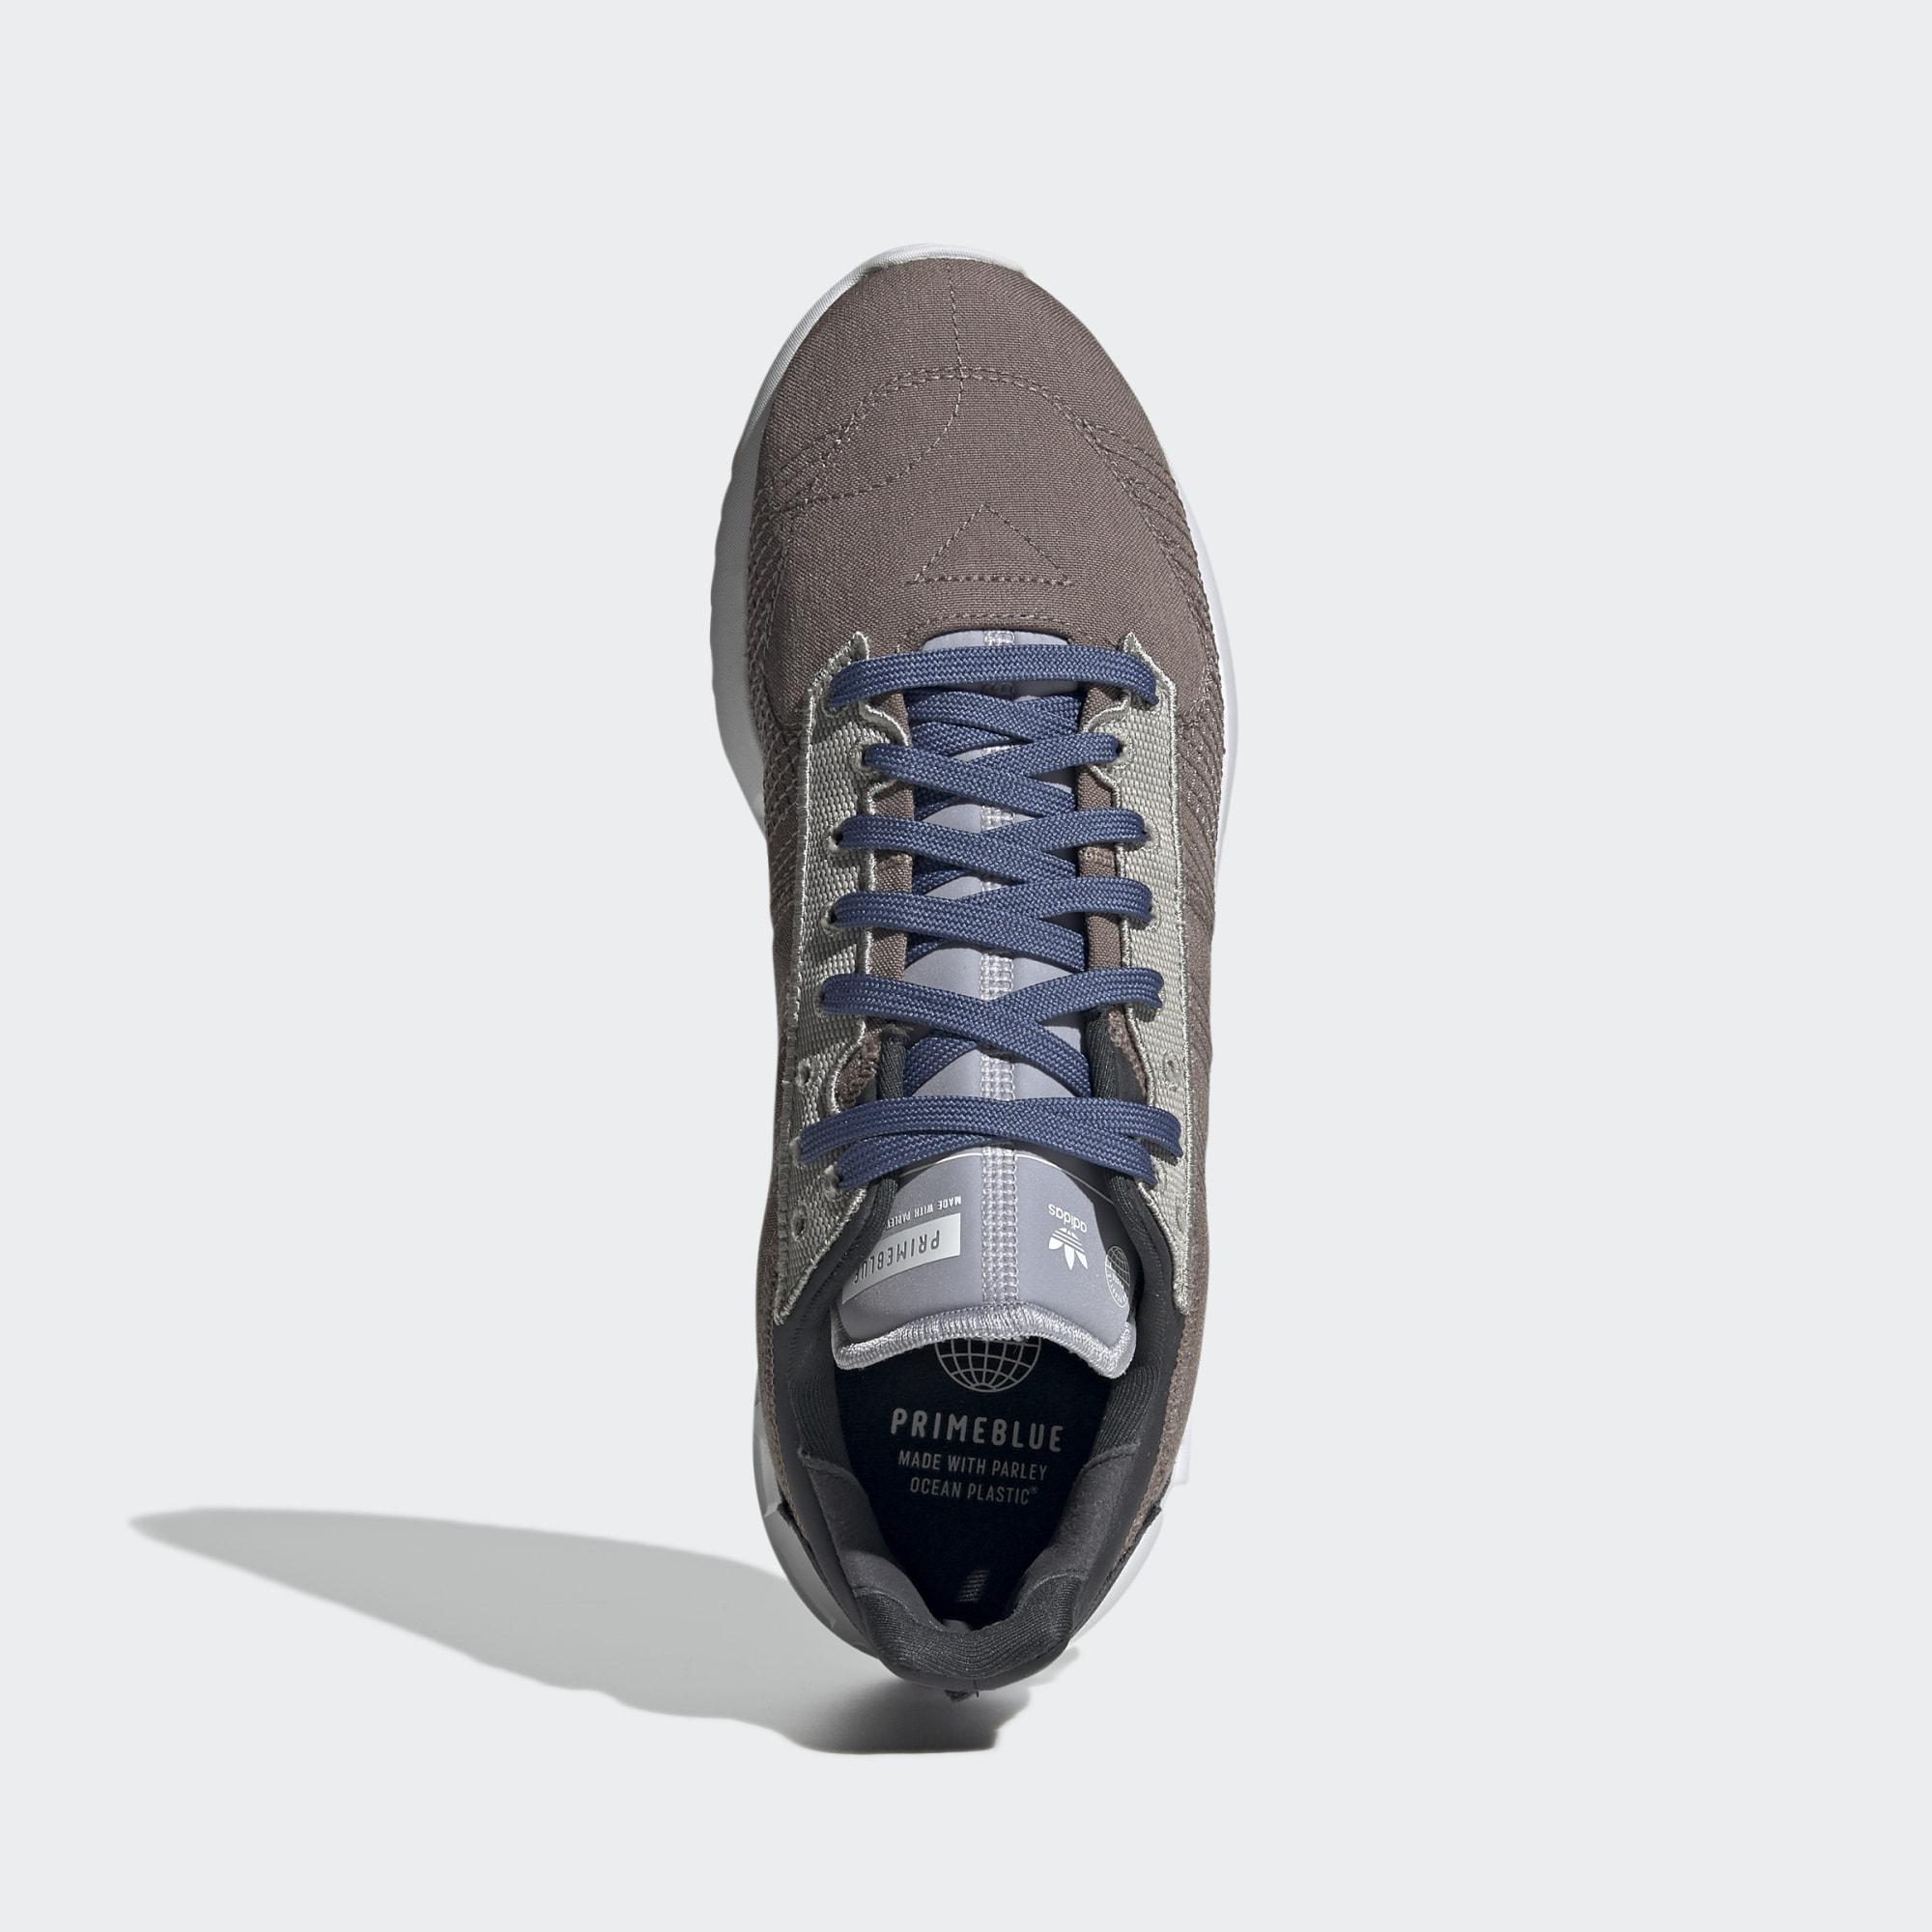 Geodiver_Primeblue_Shoes_Gra_FZ4688_02_standard_hover.jpg